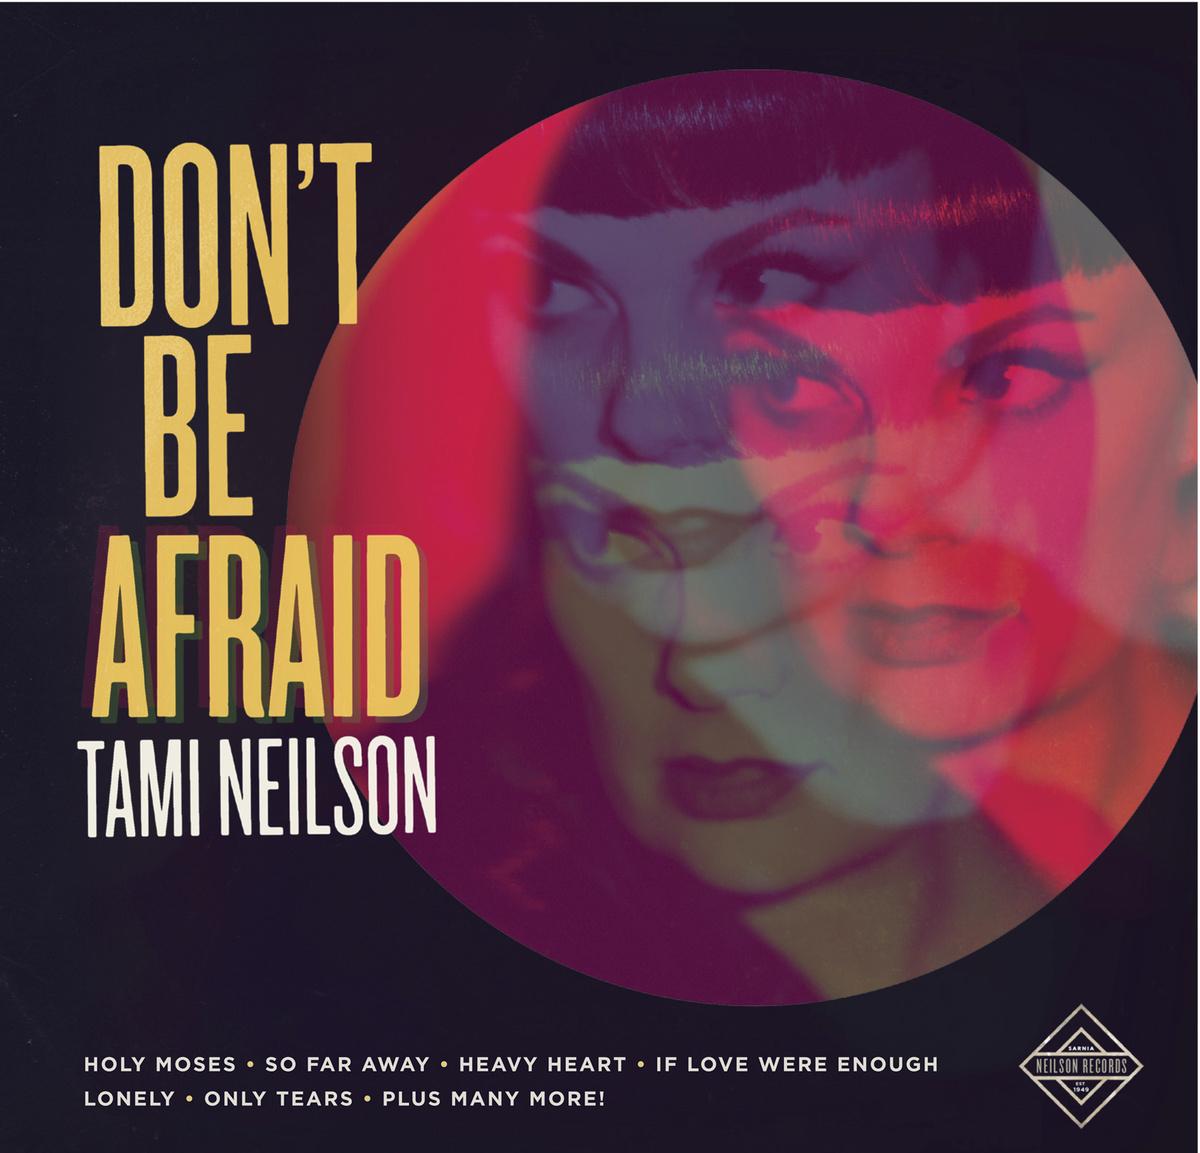 Don't be Afraid album cover